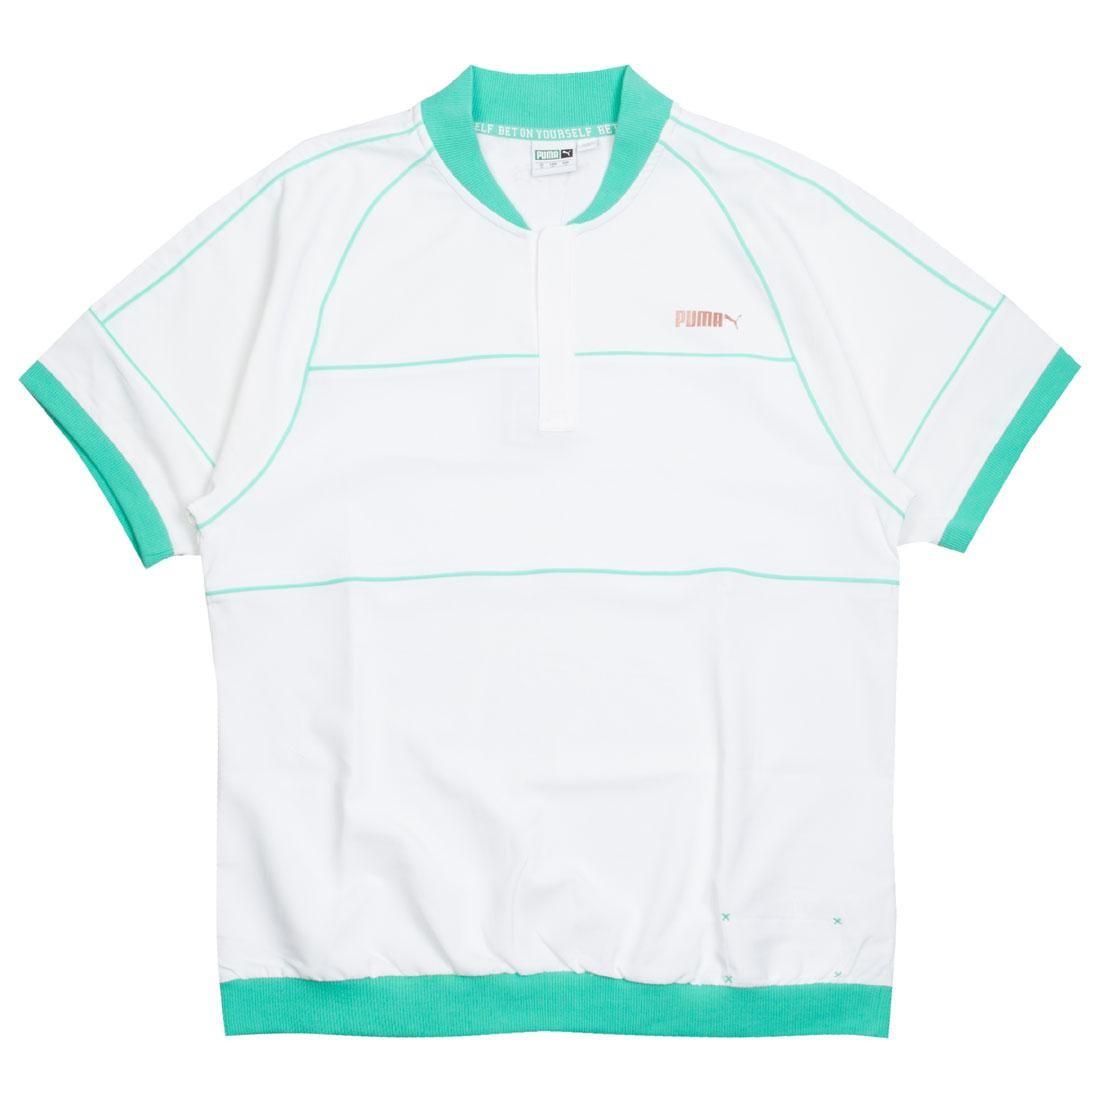 Puma x Emory Jones Men Cambridge Pullover Shirt (white / green)